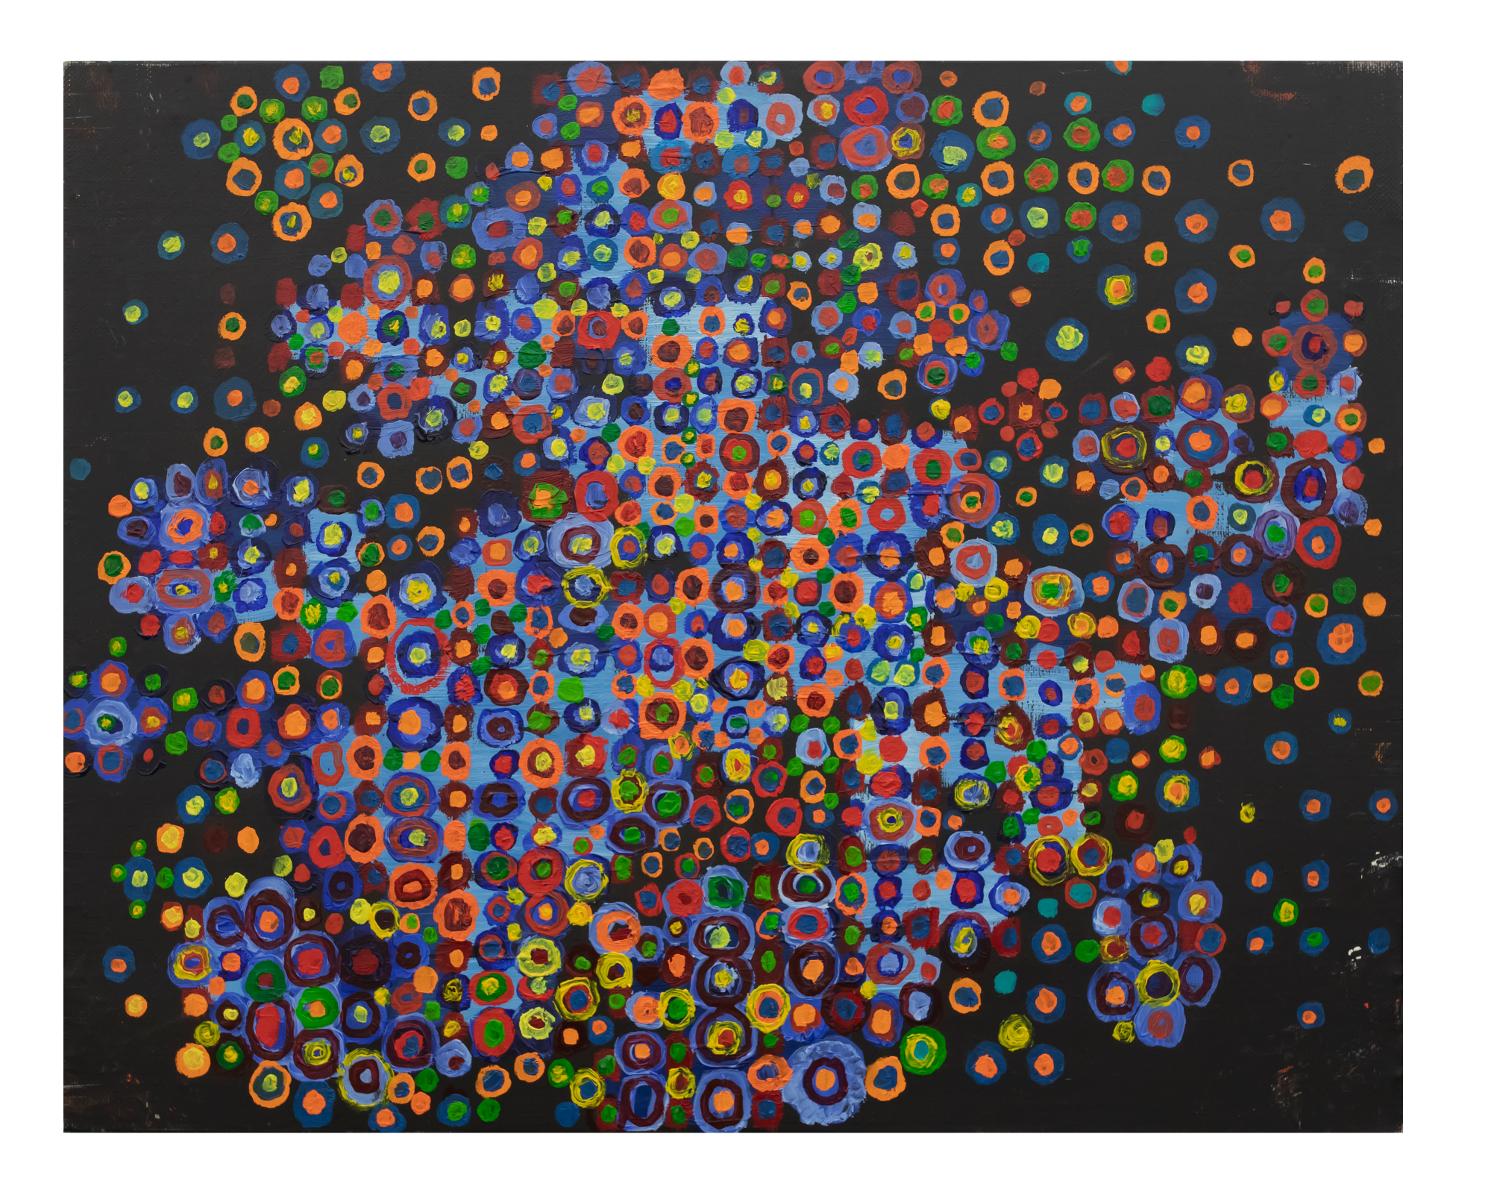 Massimo Kaufmann, Senza titolo, olio su tela, cm 40x50 [MK 003]